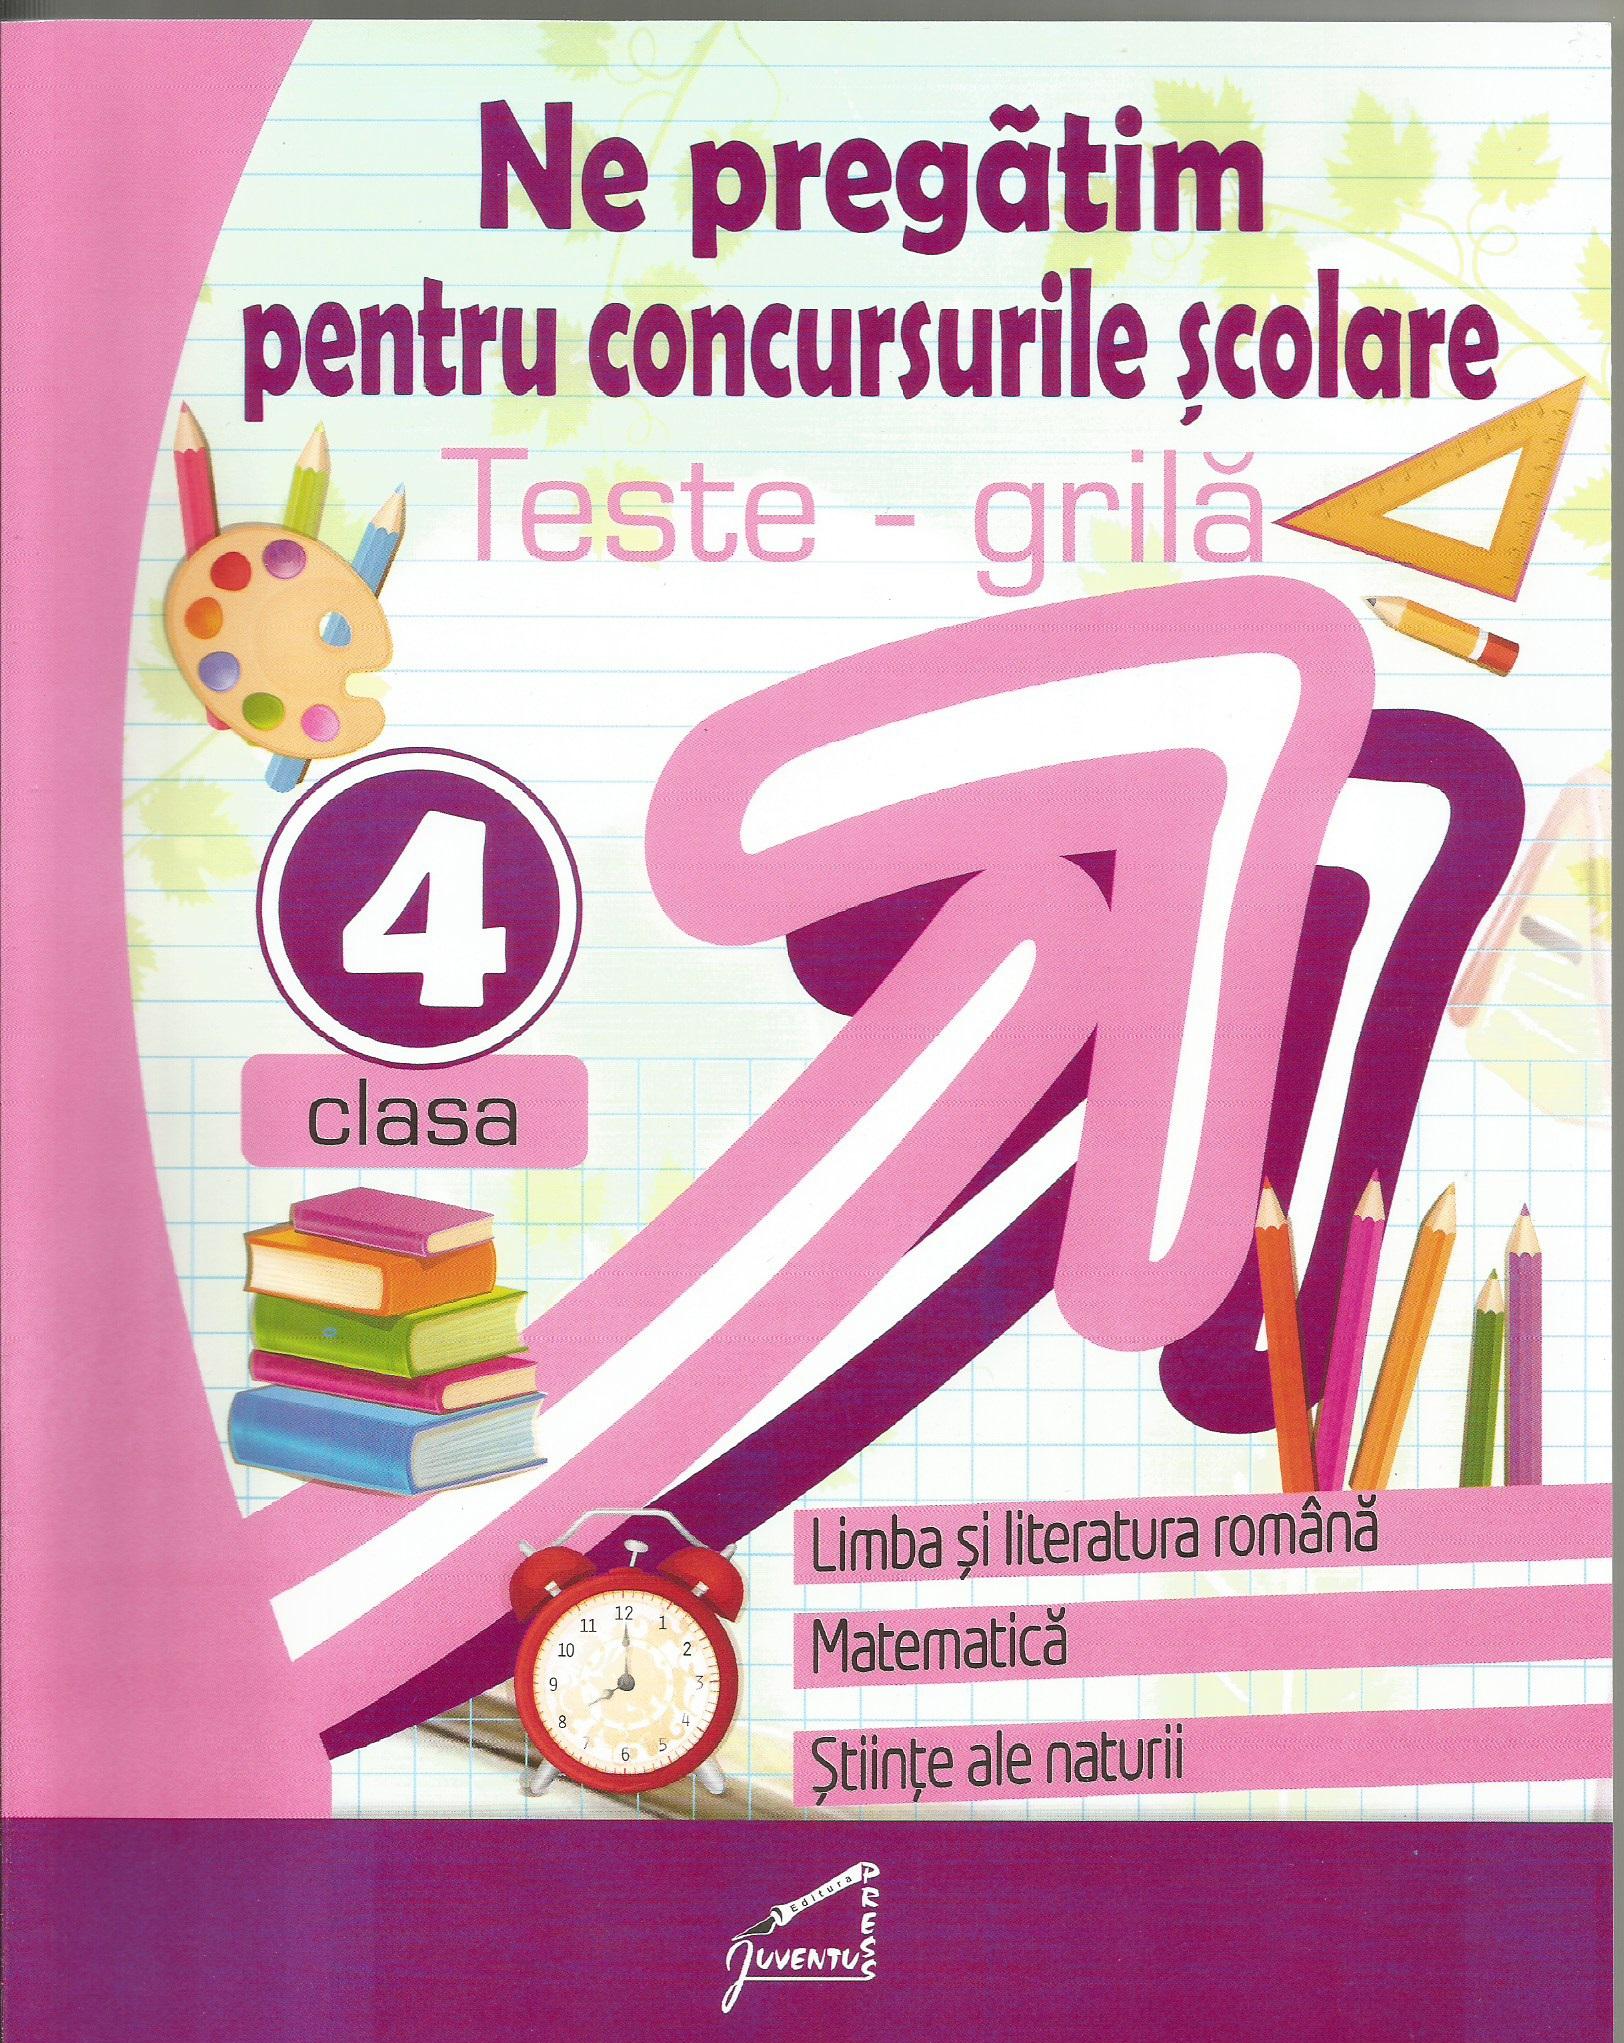 Performer. Teste grila - Clasa a IV-a. Limba si literatura romana, Matematica, Stiinte ale naturii